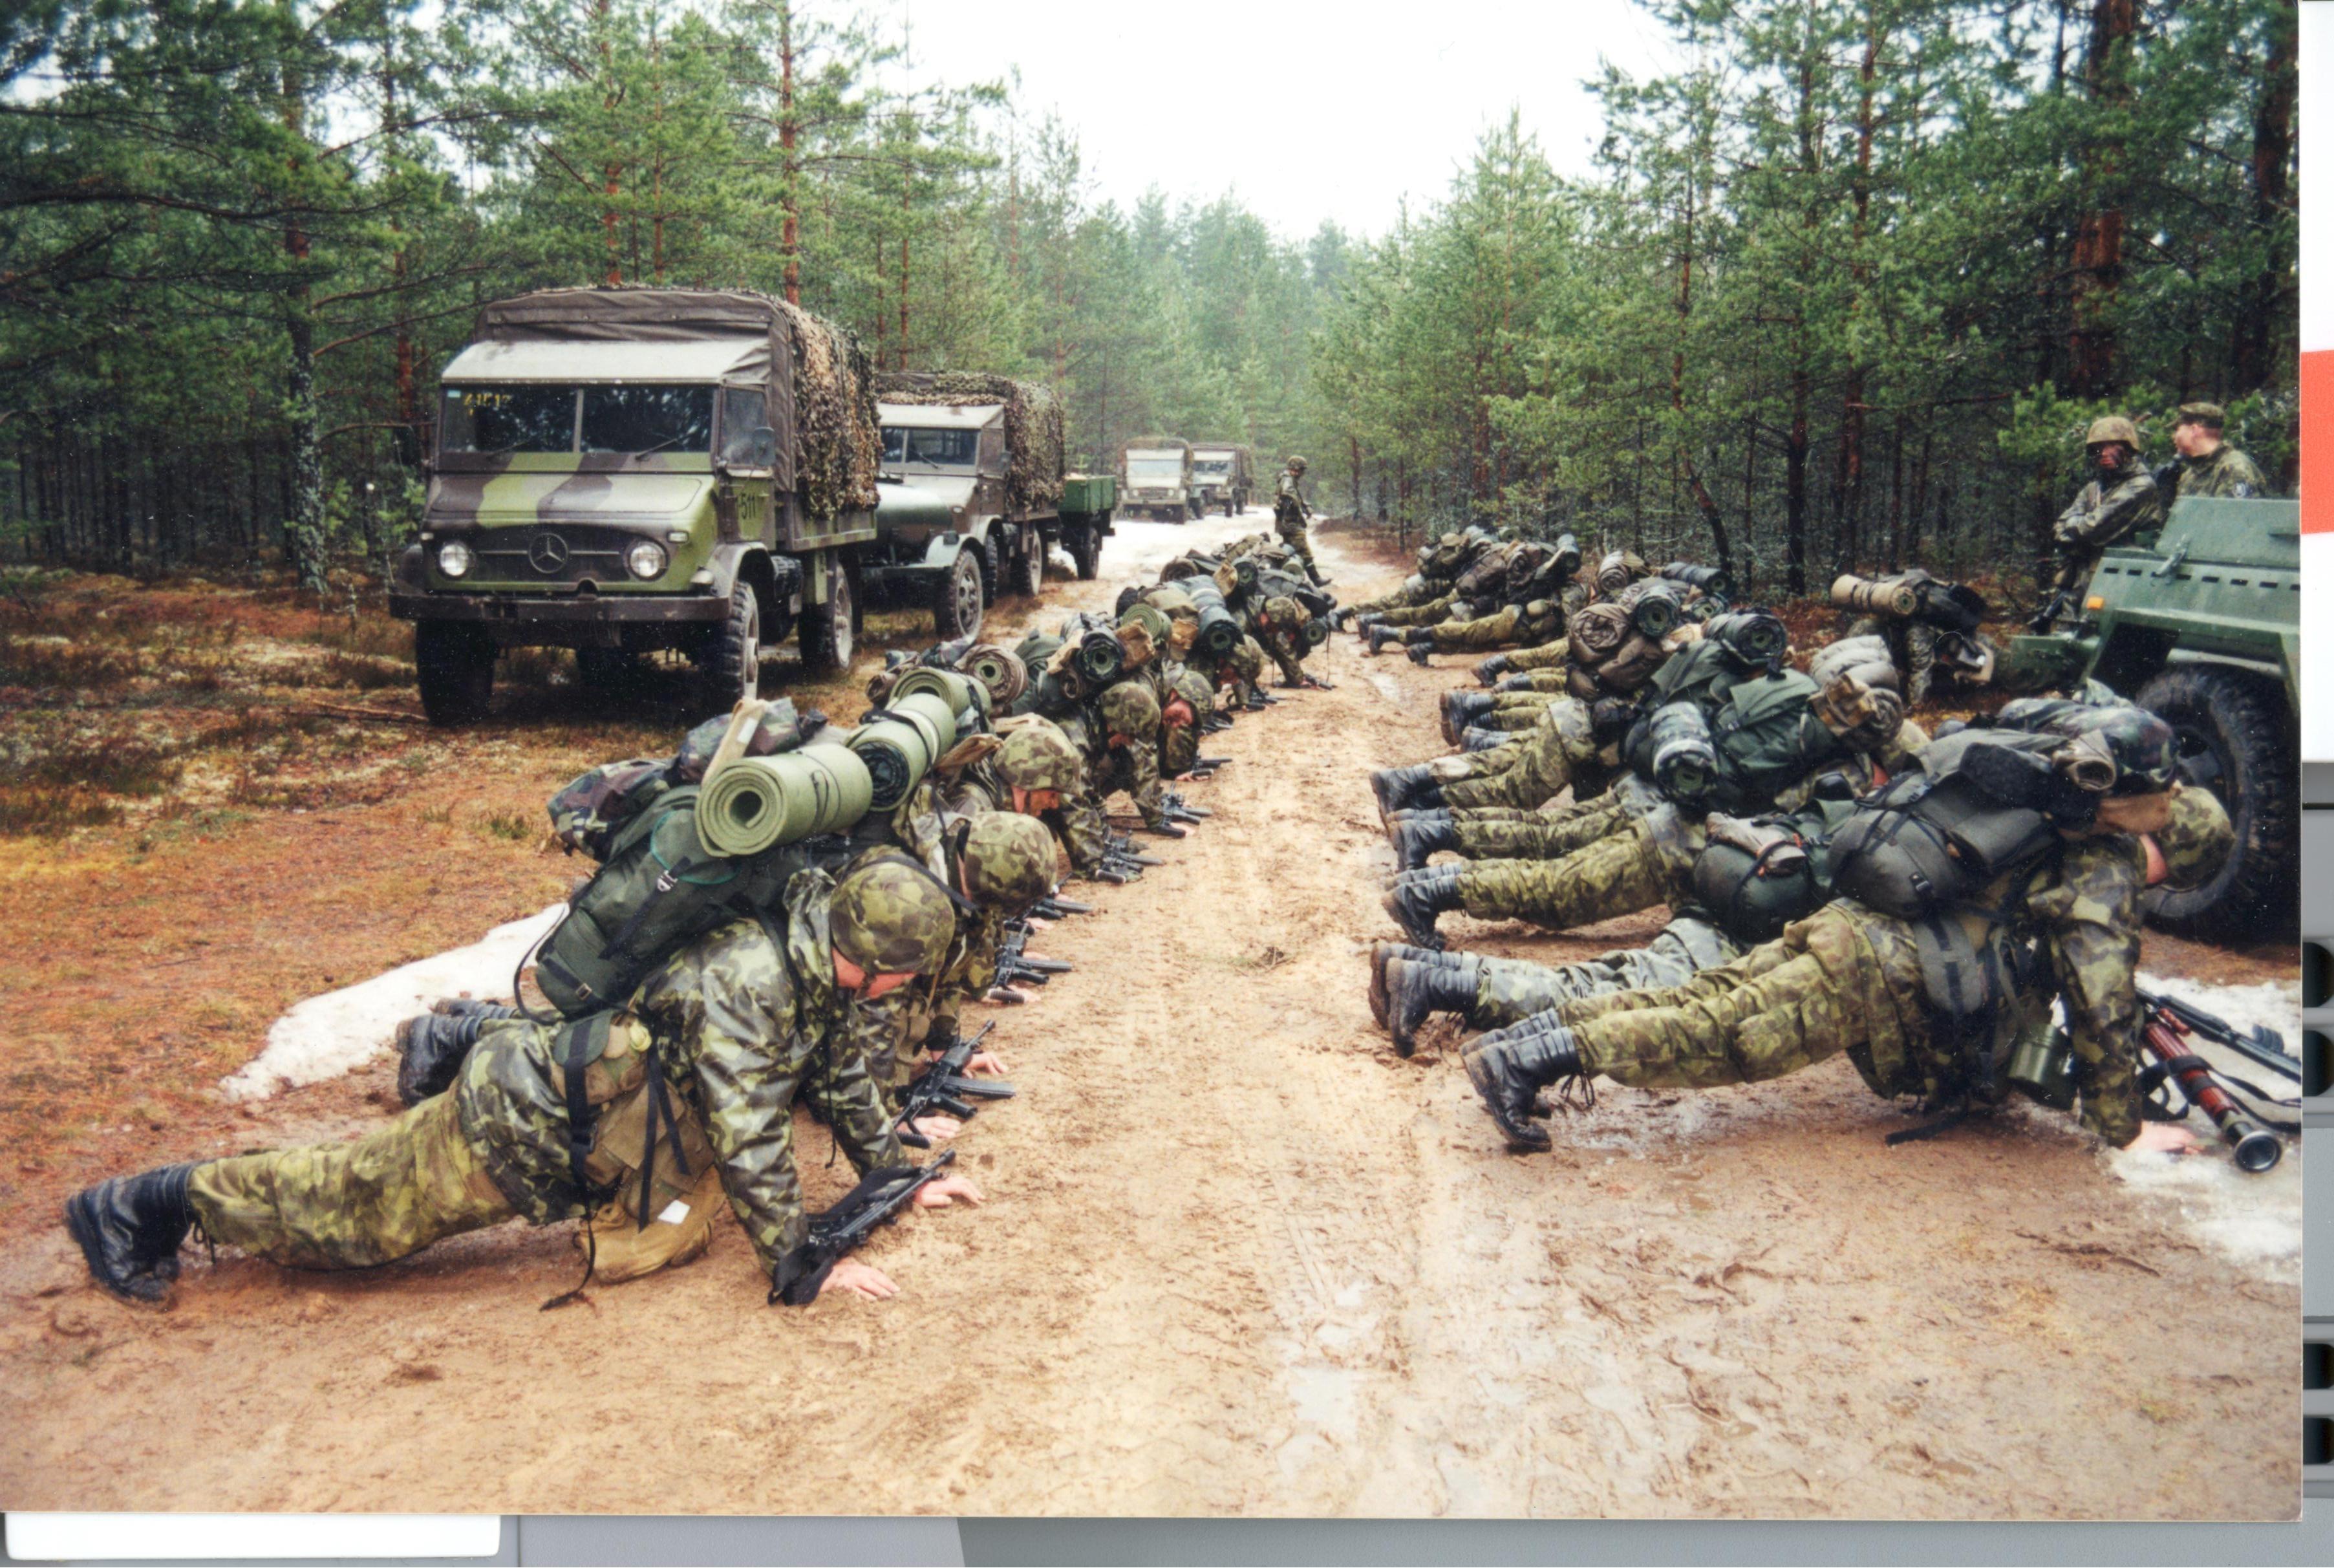 Kuperjanovi pataljon õppustel 1999. Foto: Ants Laaneotsa erakogu